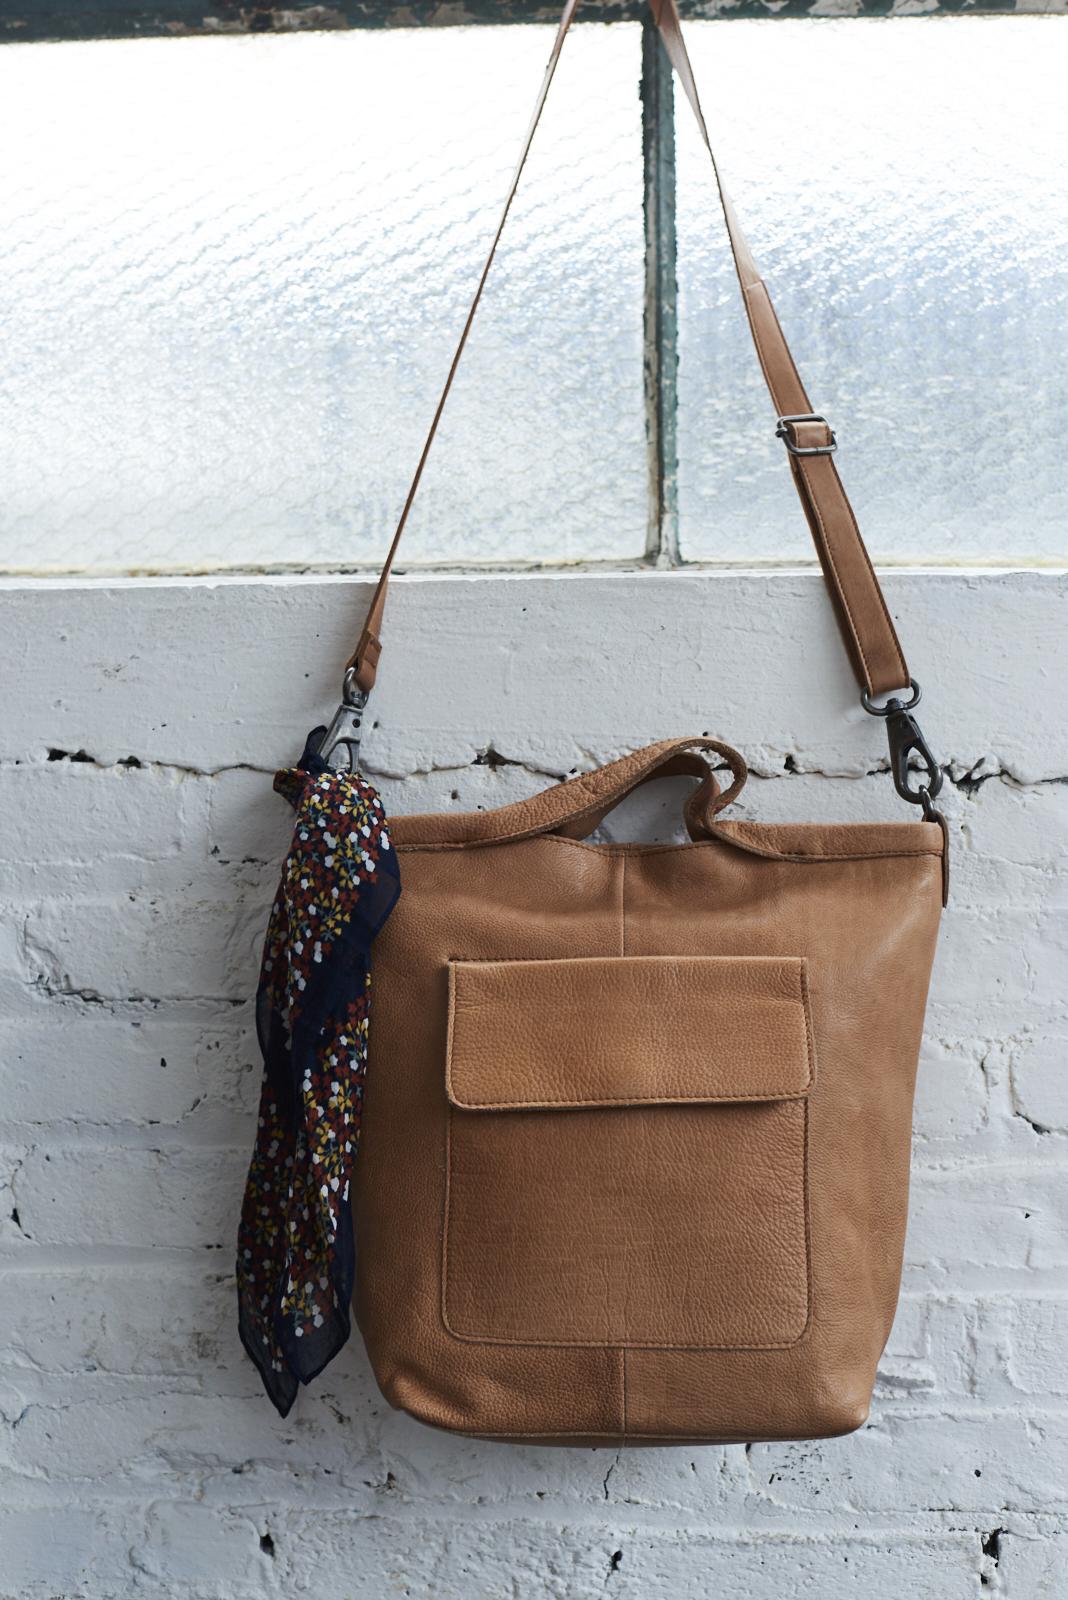 Latico leather's Bianca handbag.